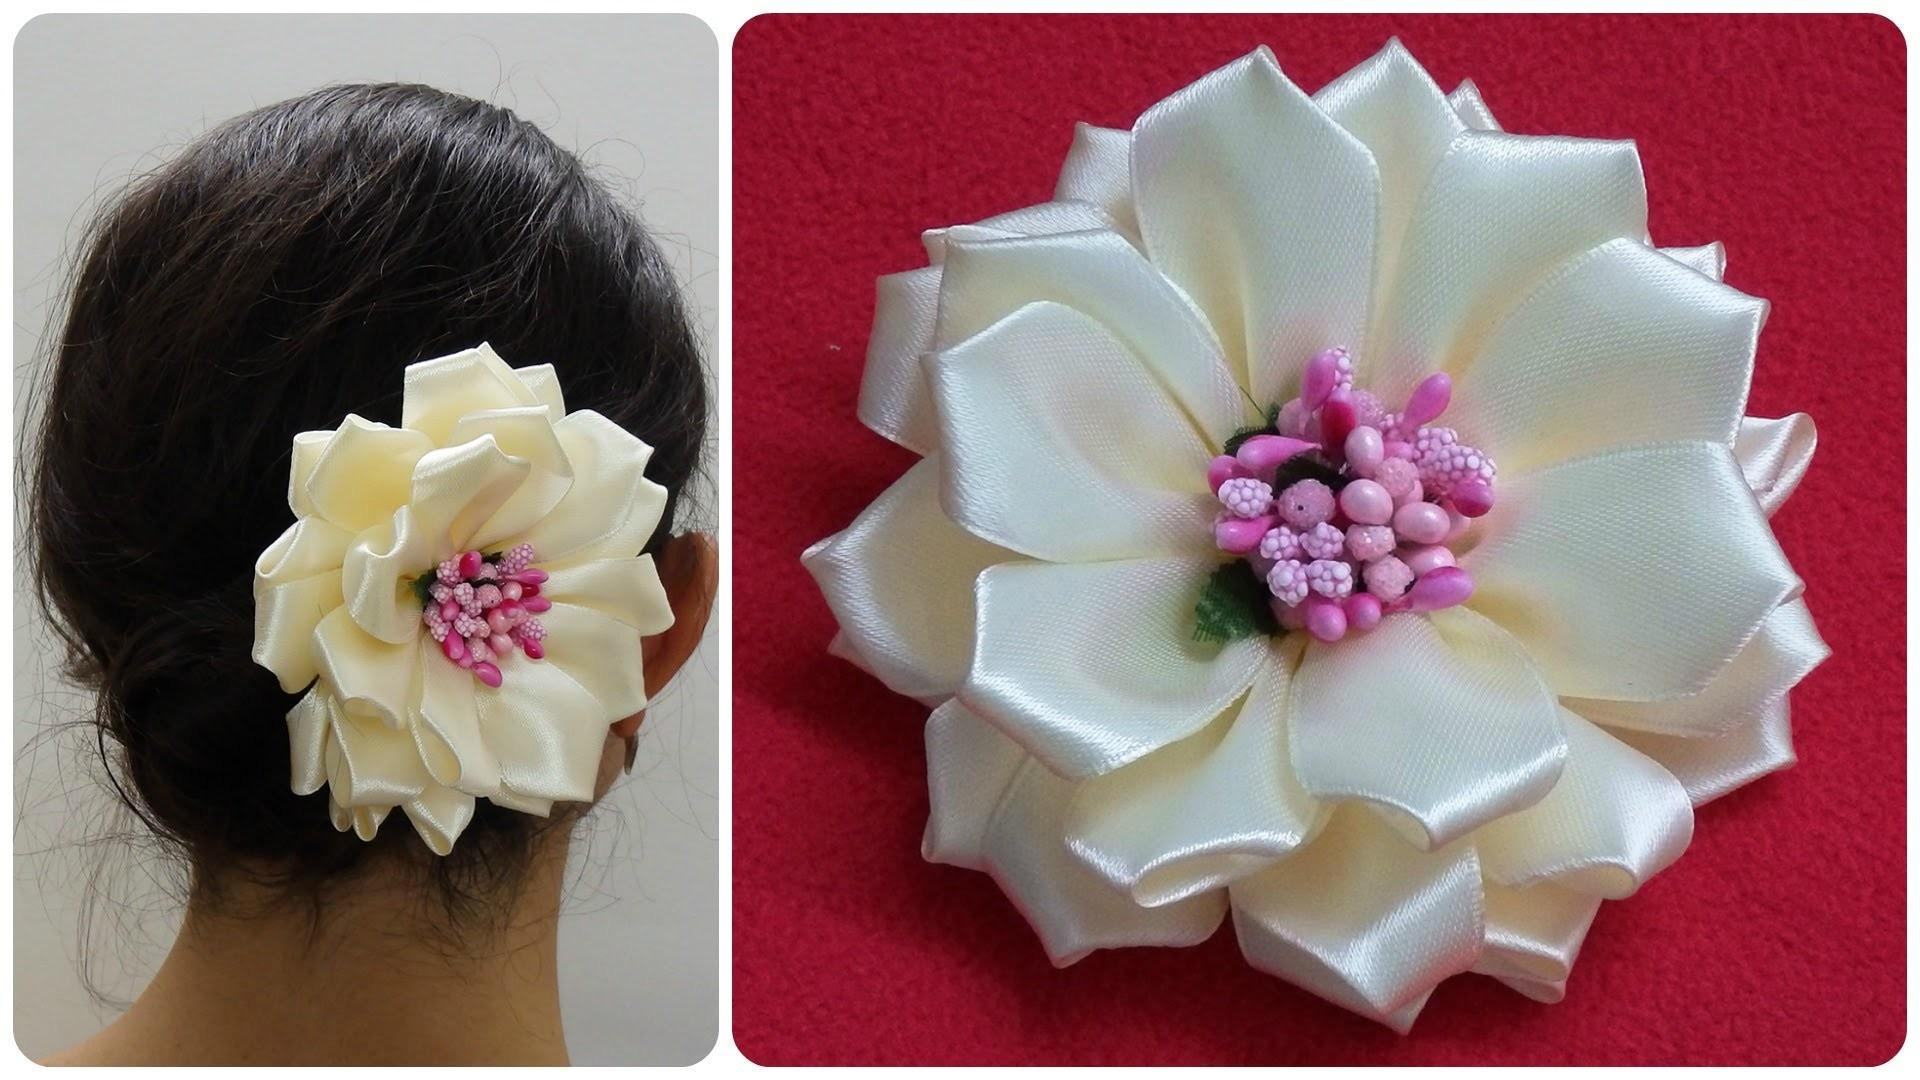 Diy kanzashi flower,wedding hair accessoire,Easy kanzashi flower tutorial